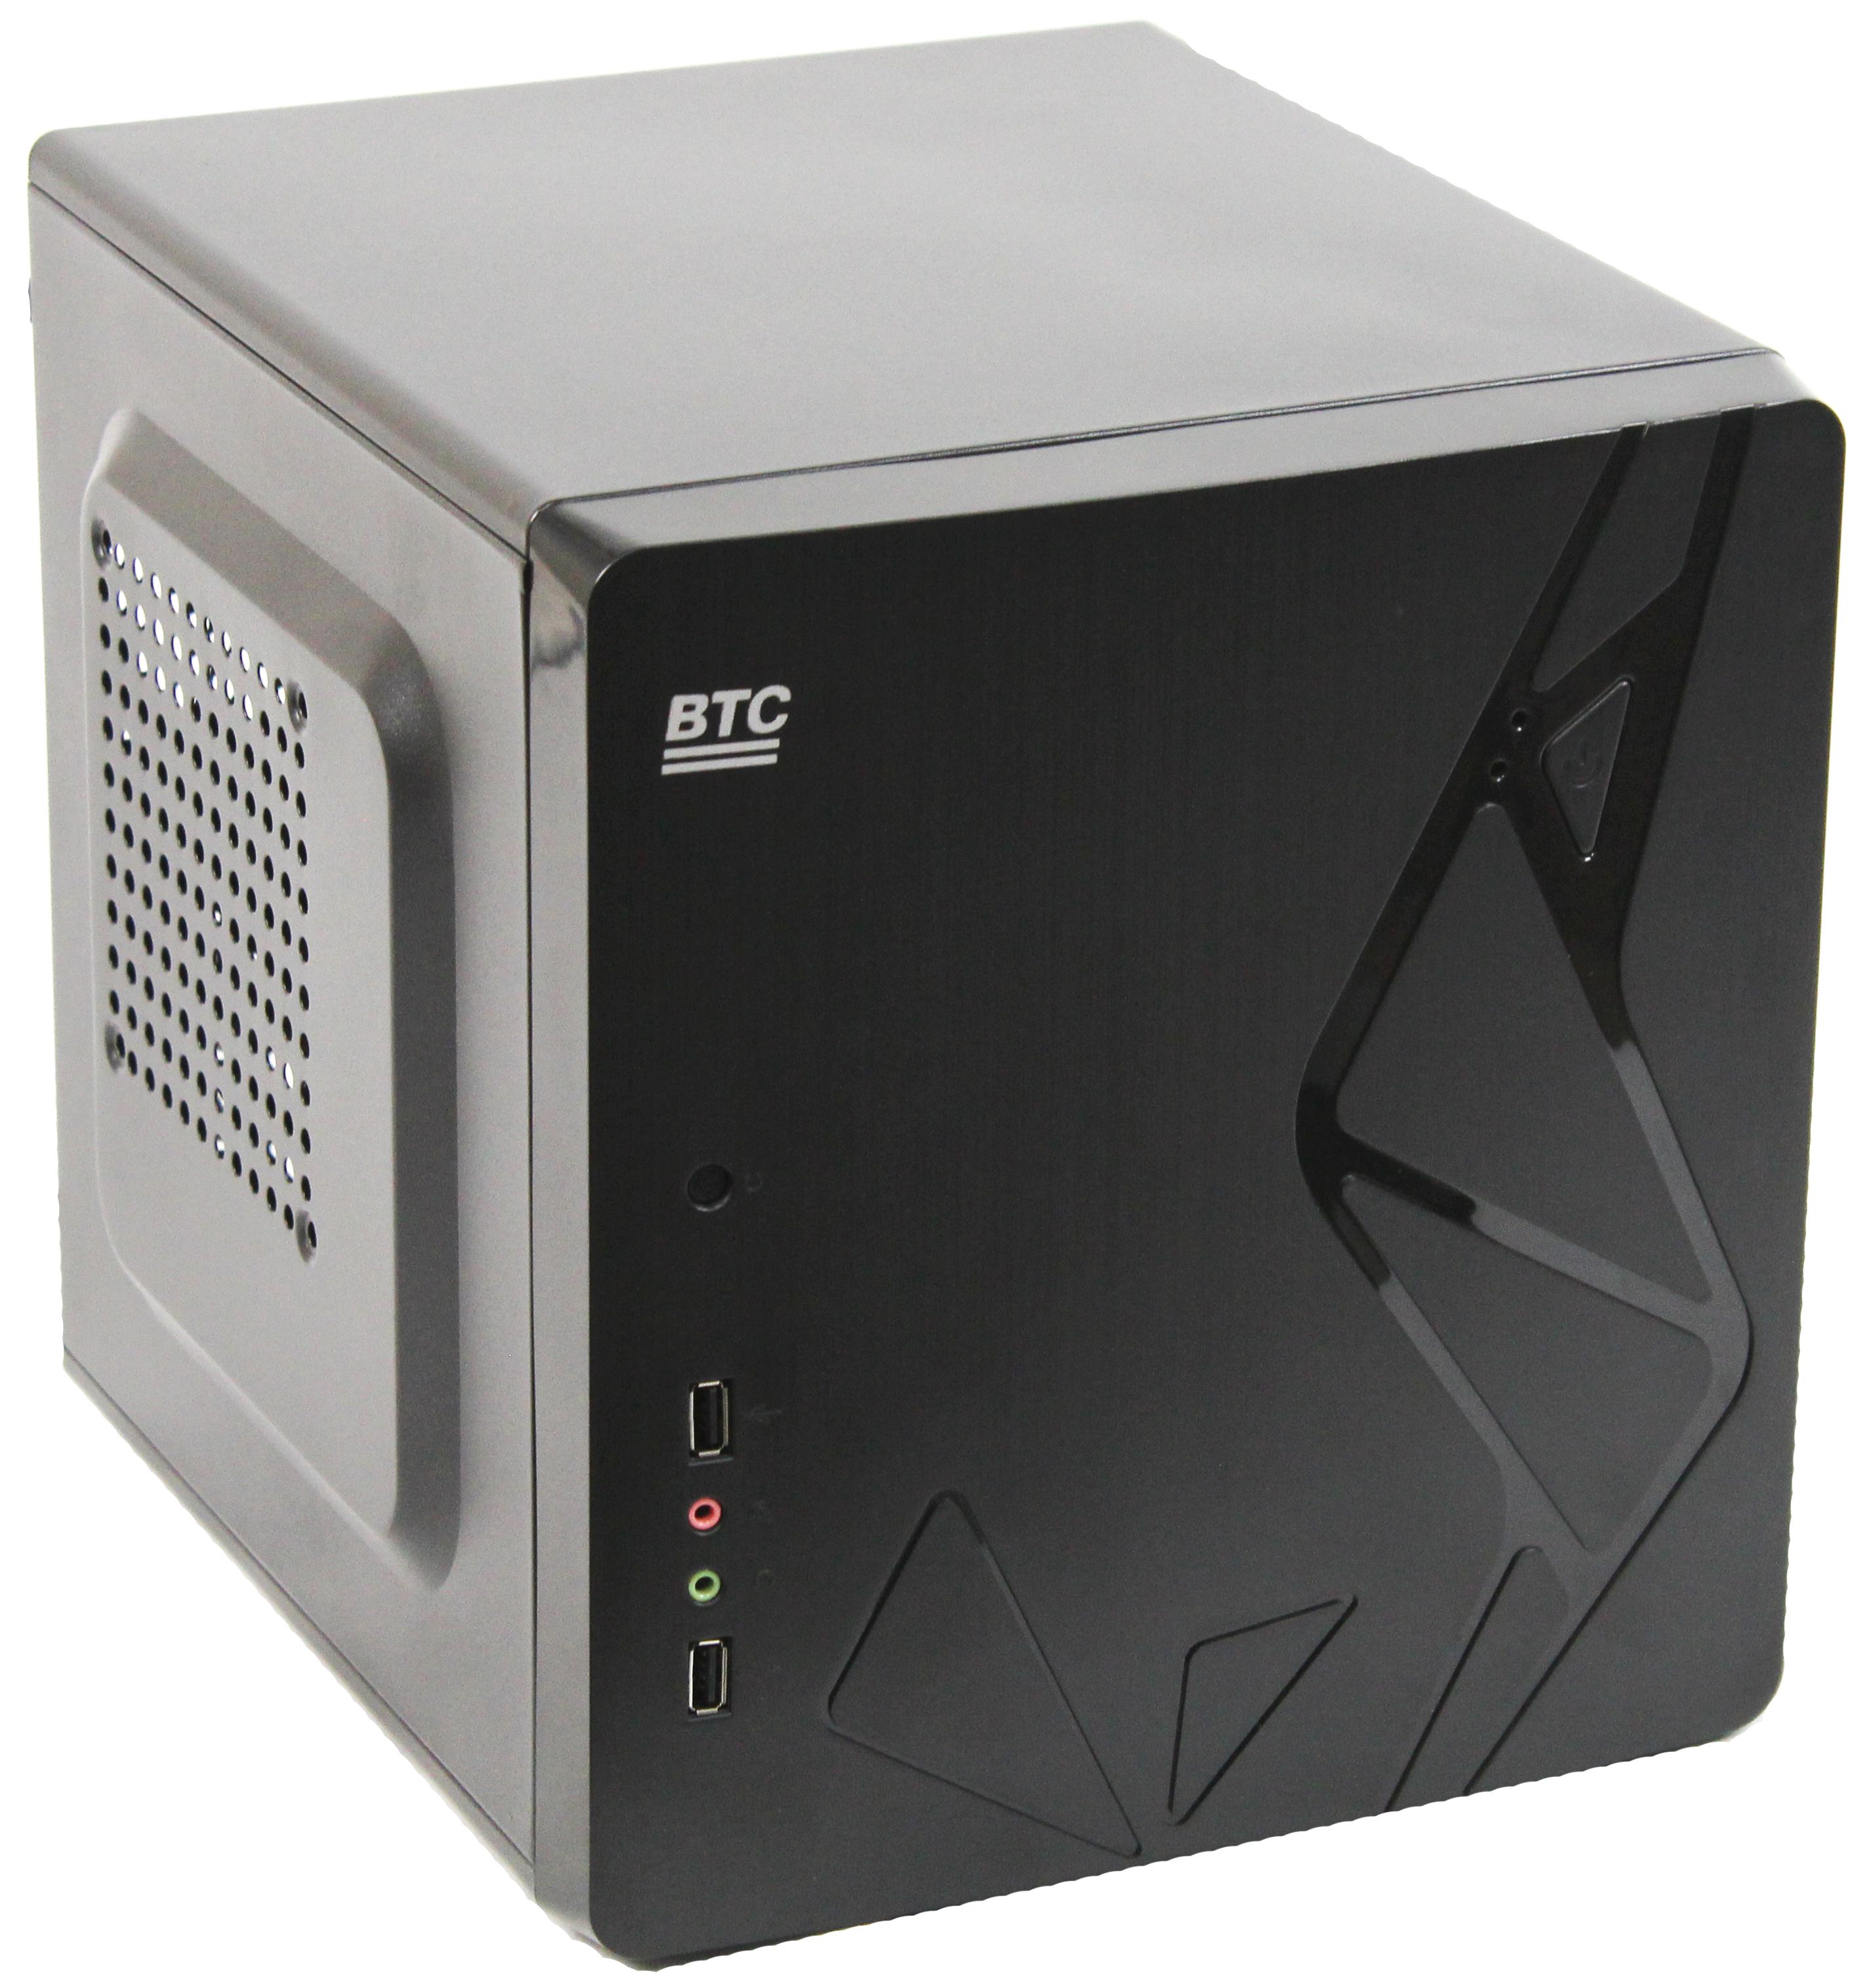 Компьютер Amon Simple Game (A4411G) Новый